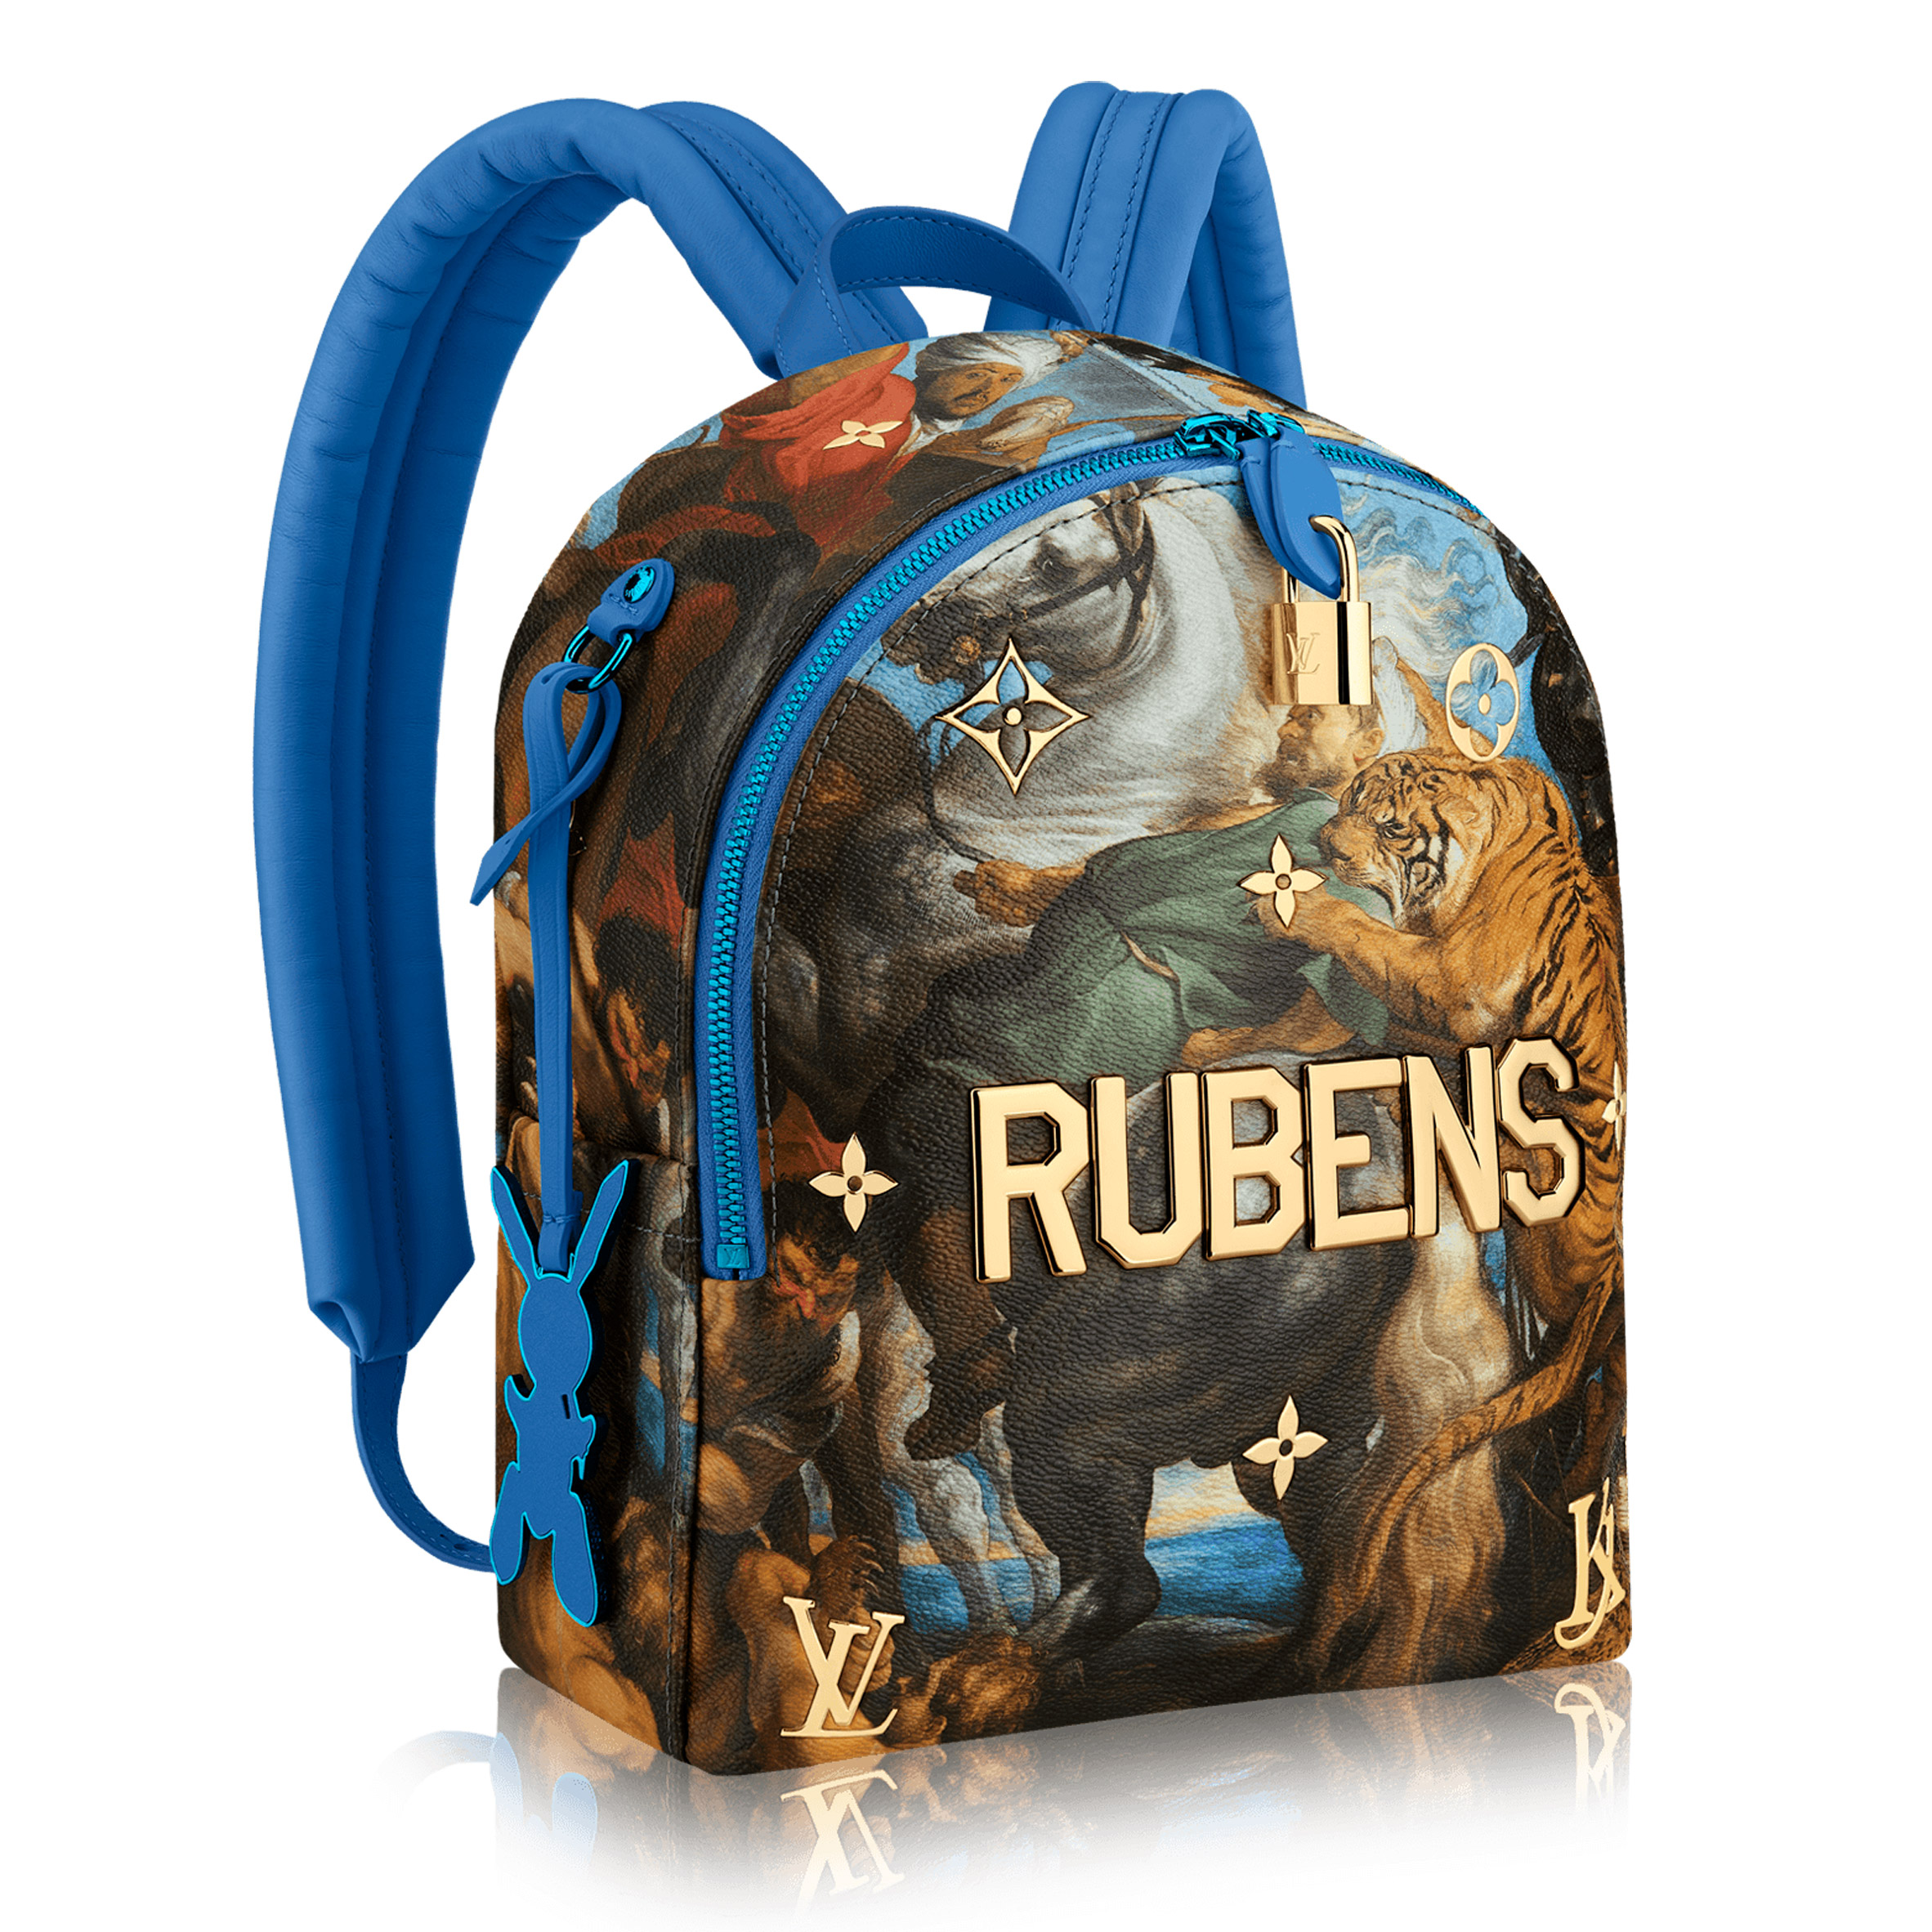 Rubens handbag